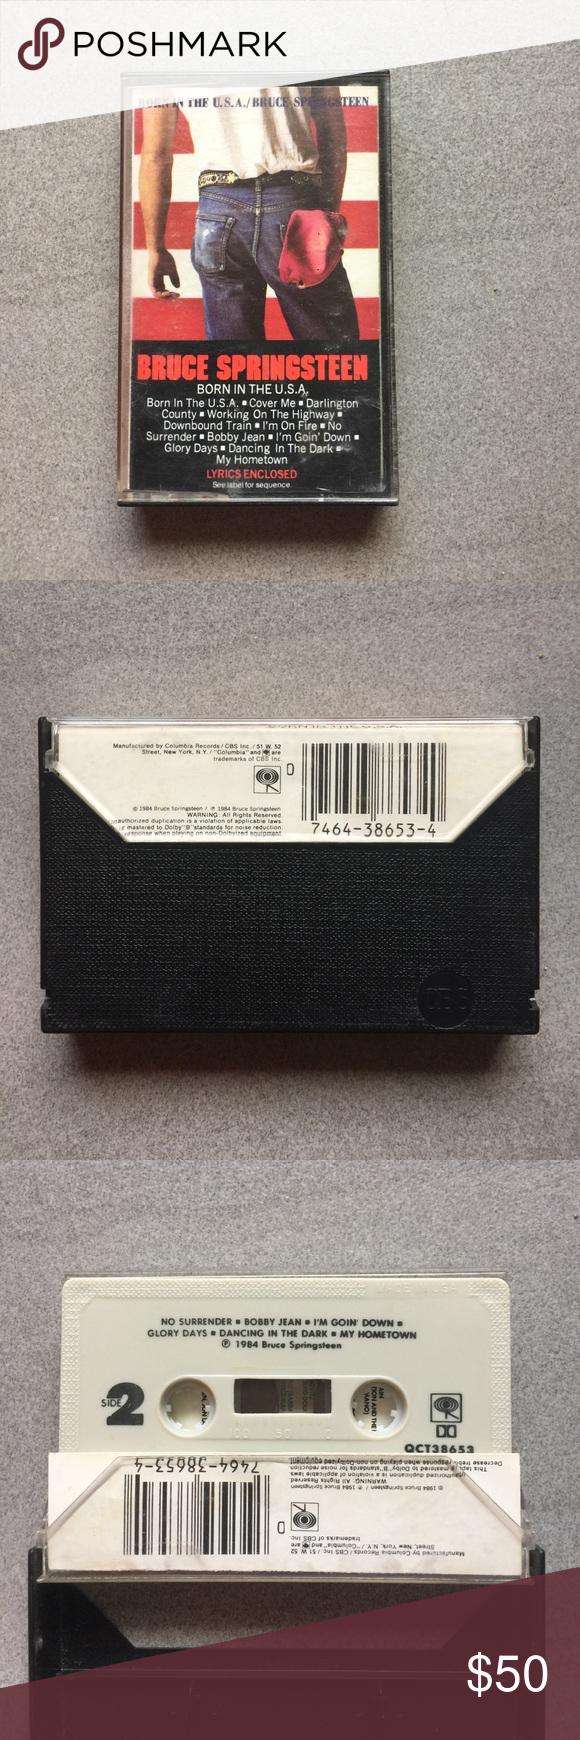 Bruce Springsteen Born In The USA Cassette Tape Bruce